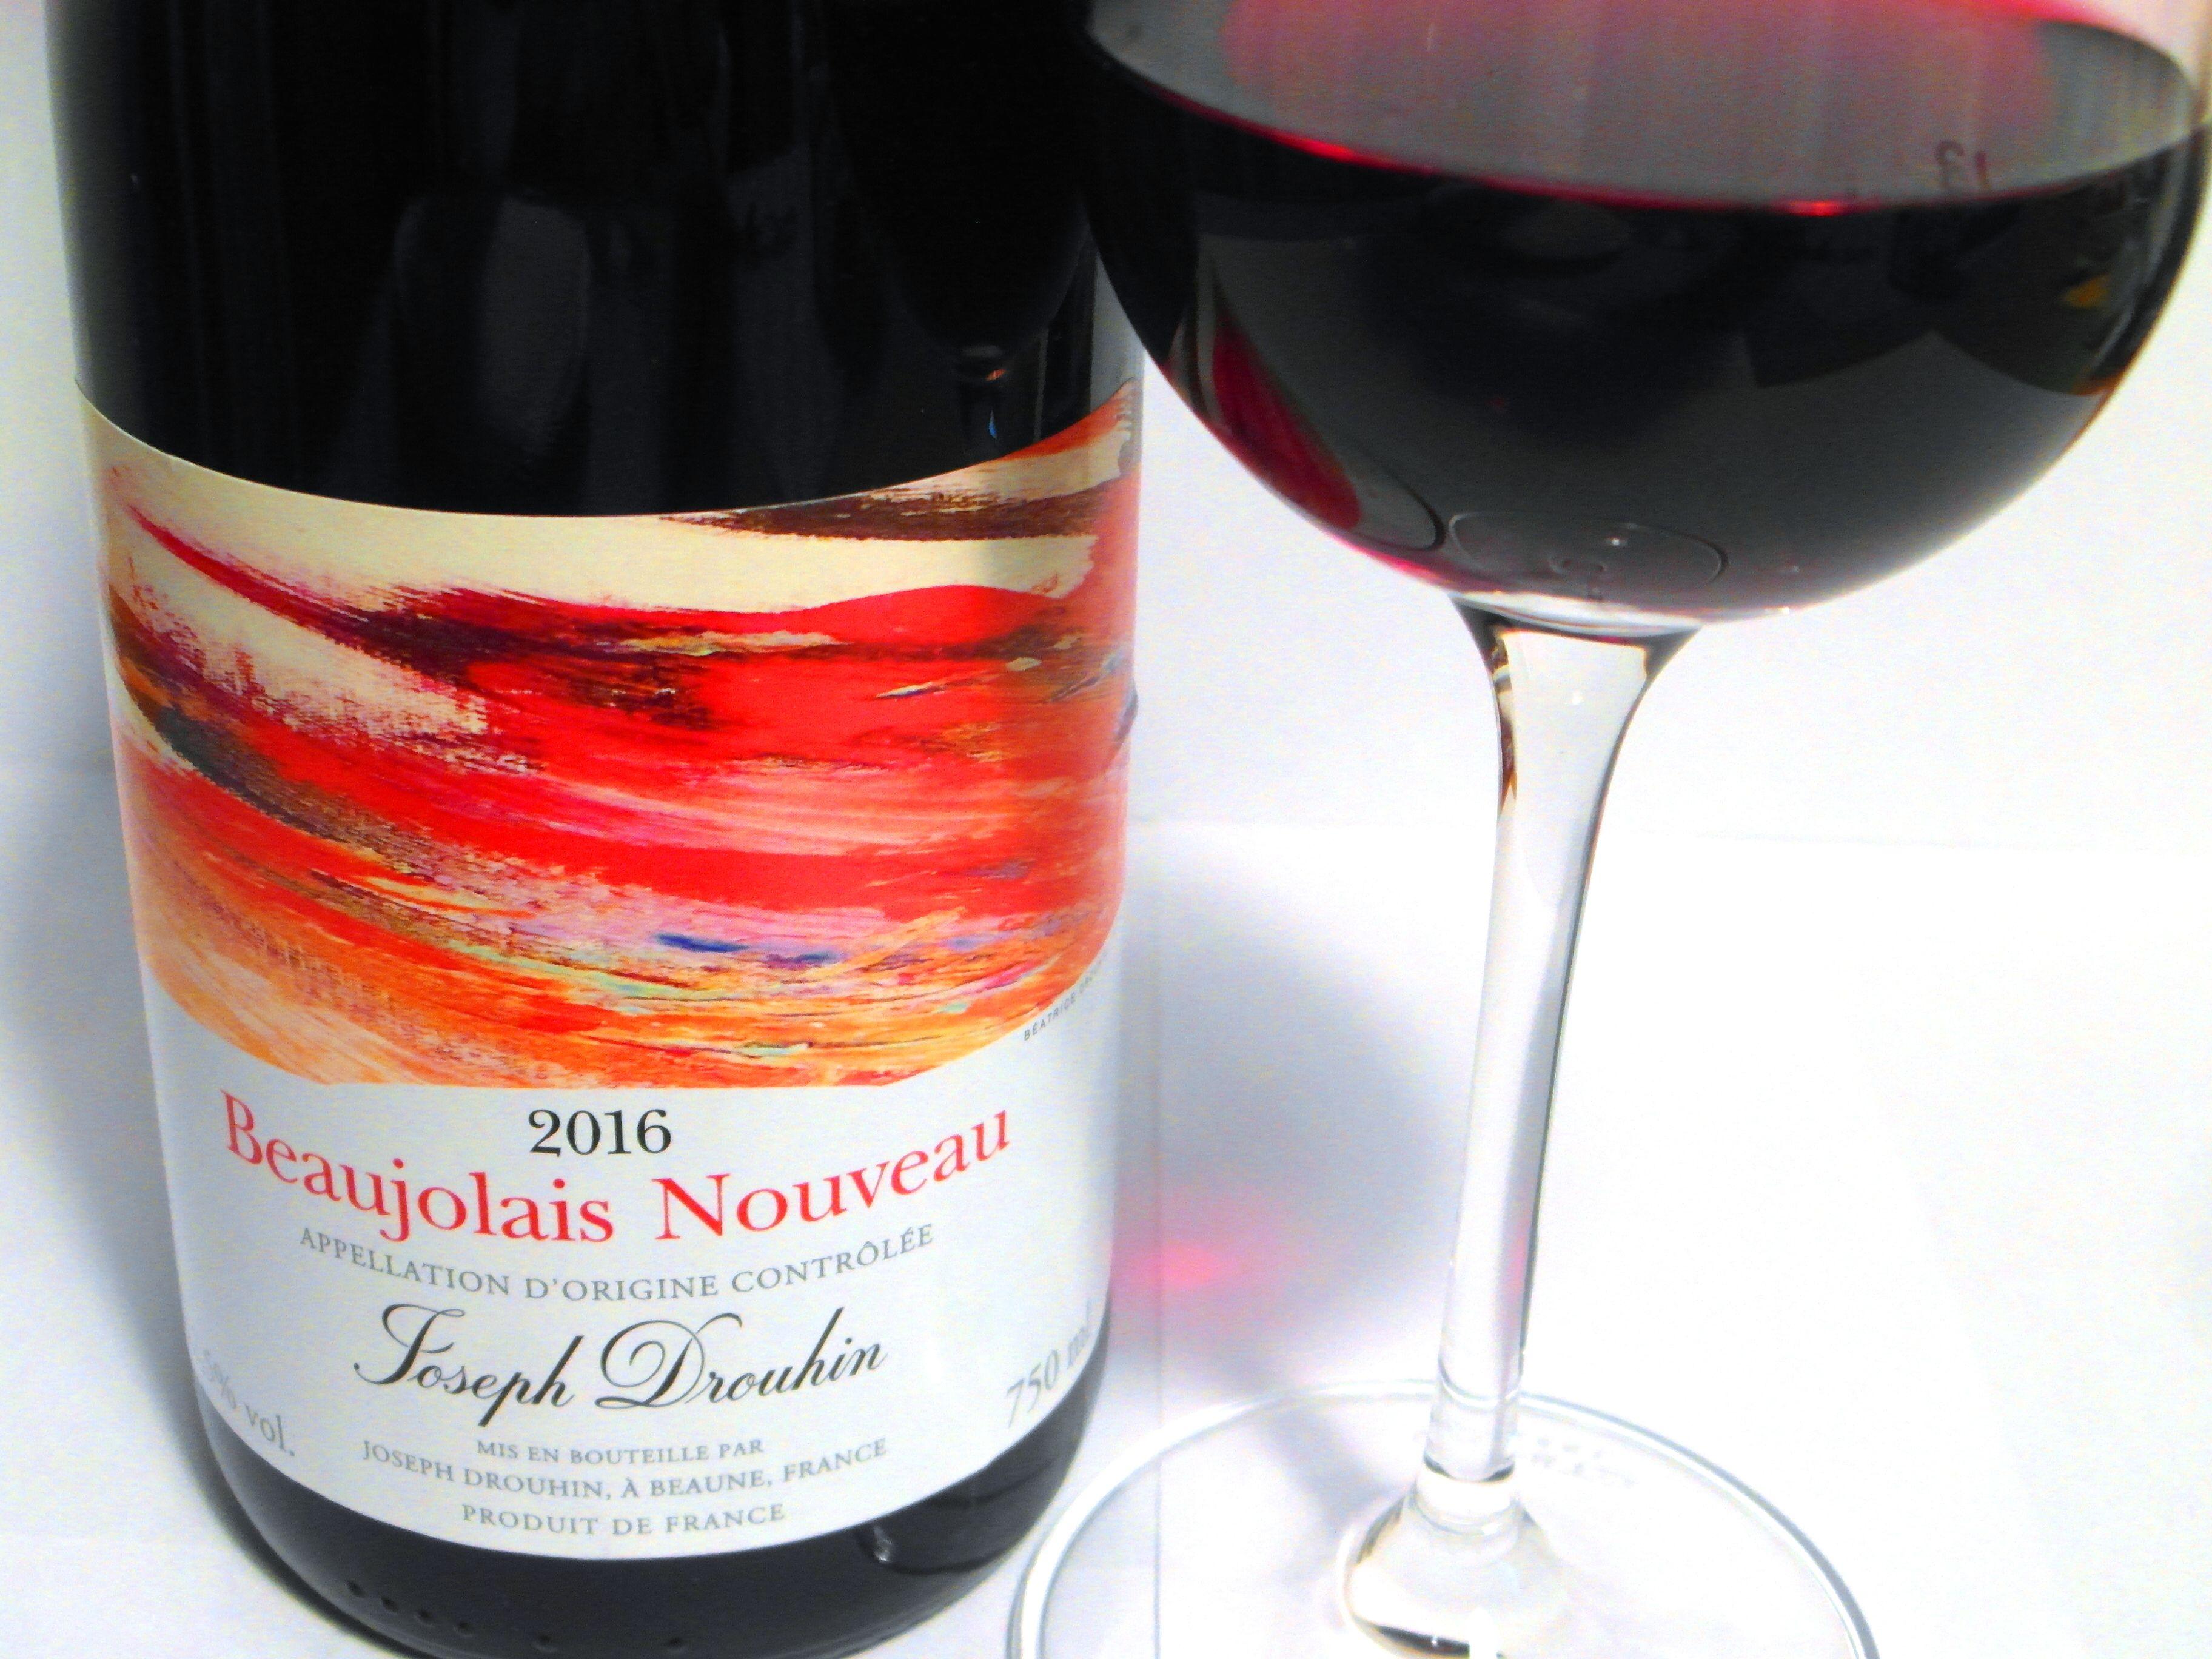 Ochutnali Ste Beaujolais 2016 Bozole Ako Vam Chutilo Beaujolais Bozole Beaujolaisnoveau Mladevino Ochutnaj Taste Wine Tasting Beaujolais Wine